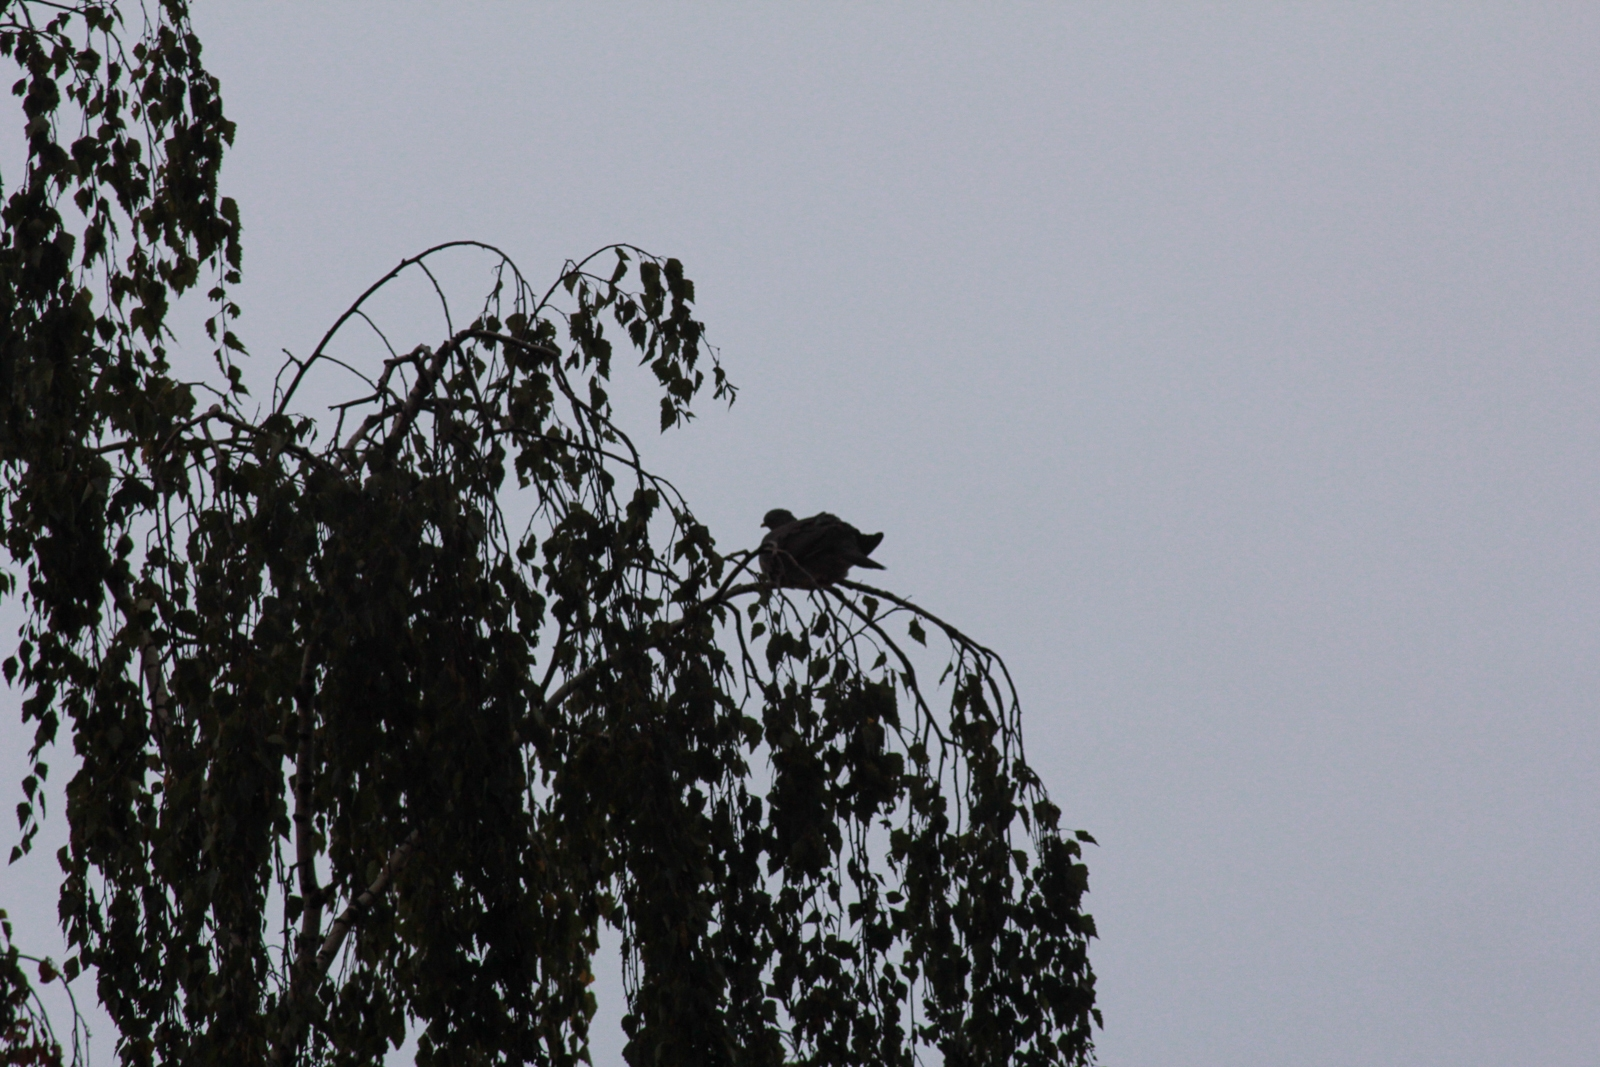 Taube auf Birke im Sturm